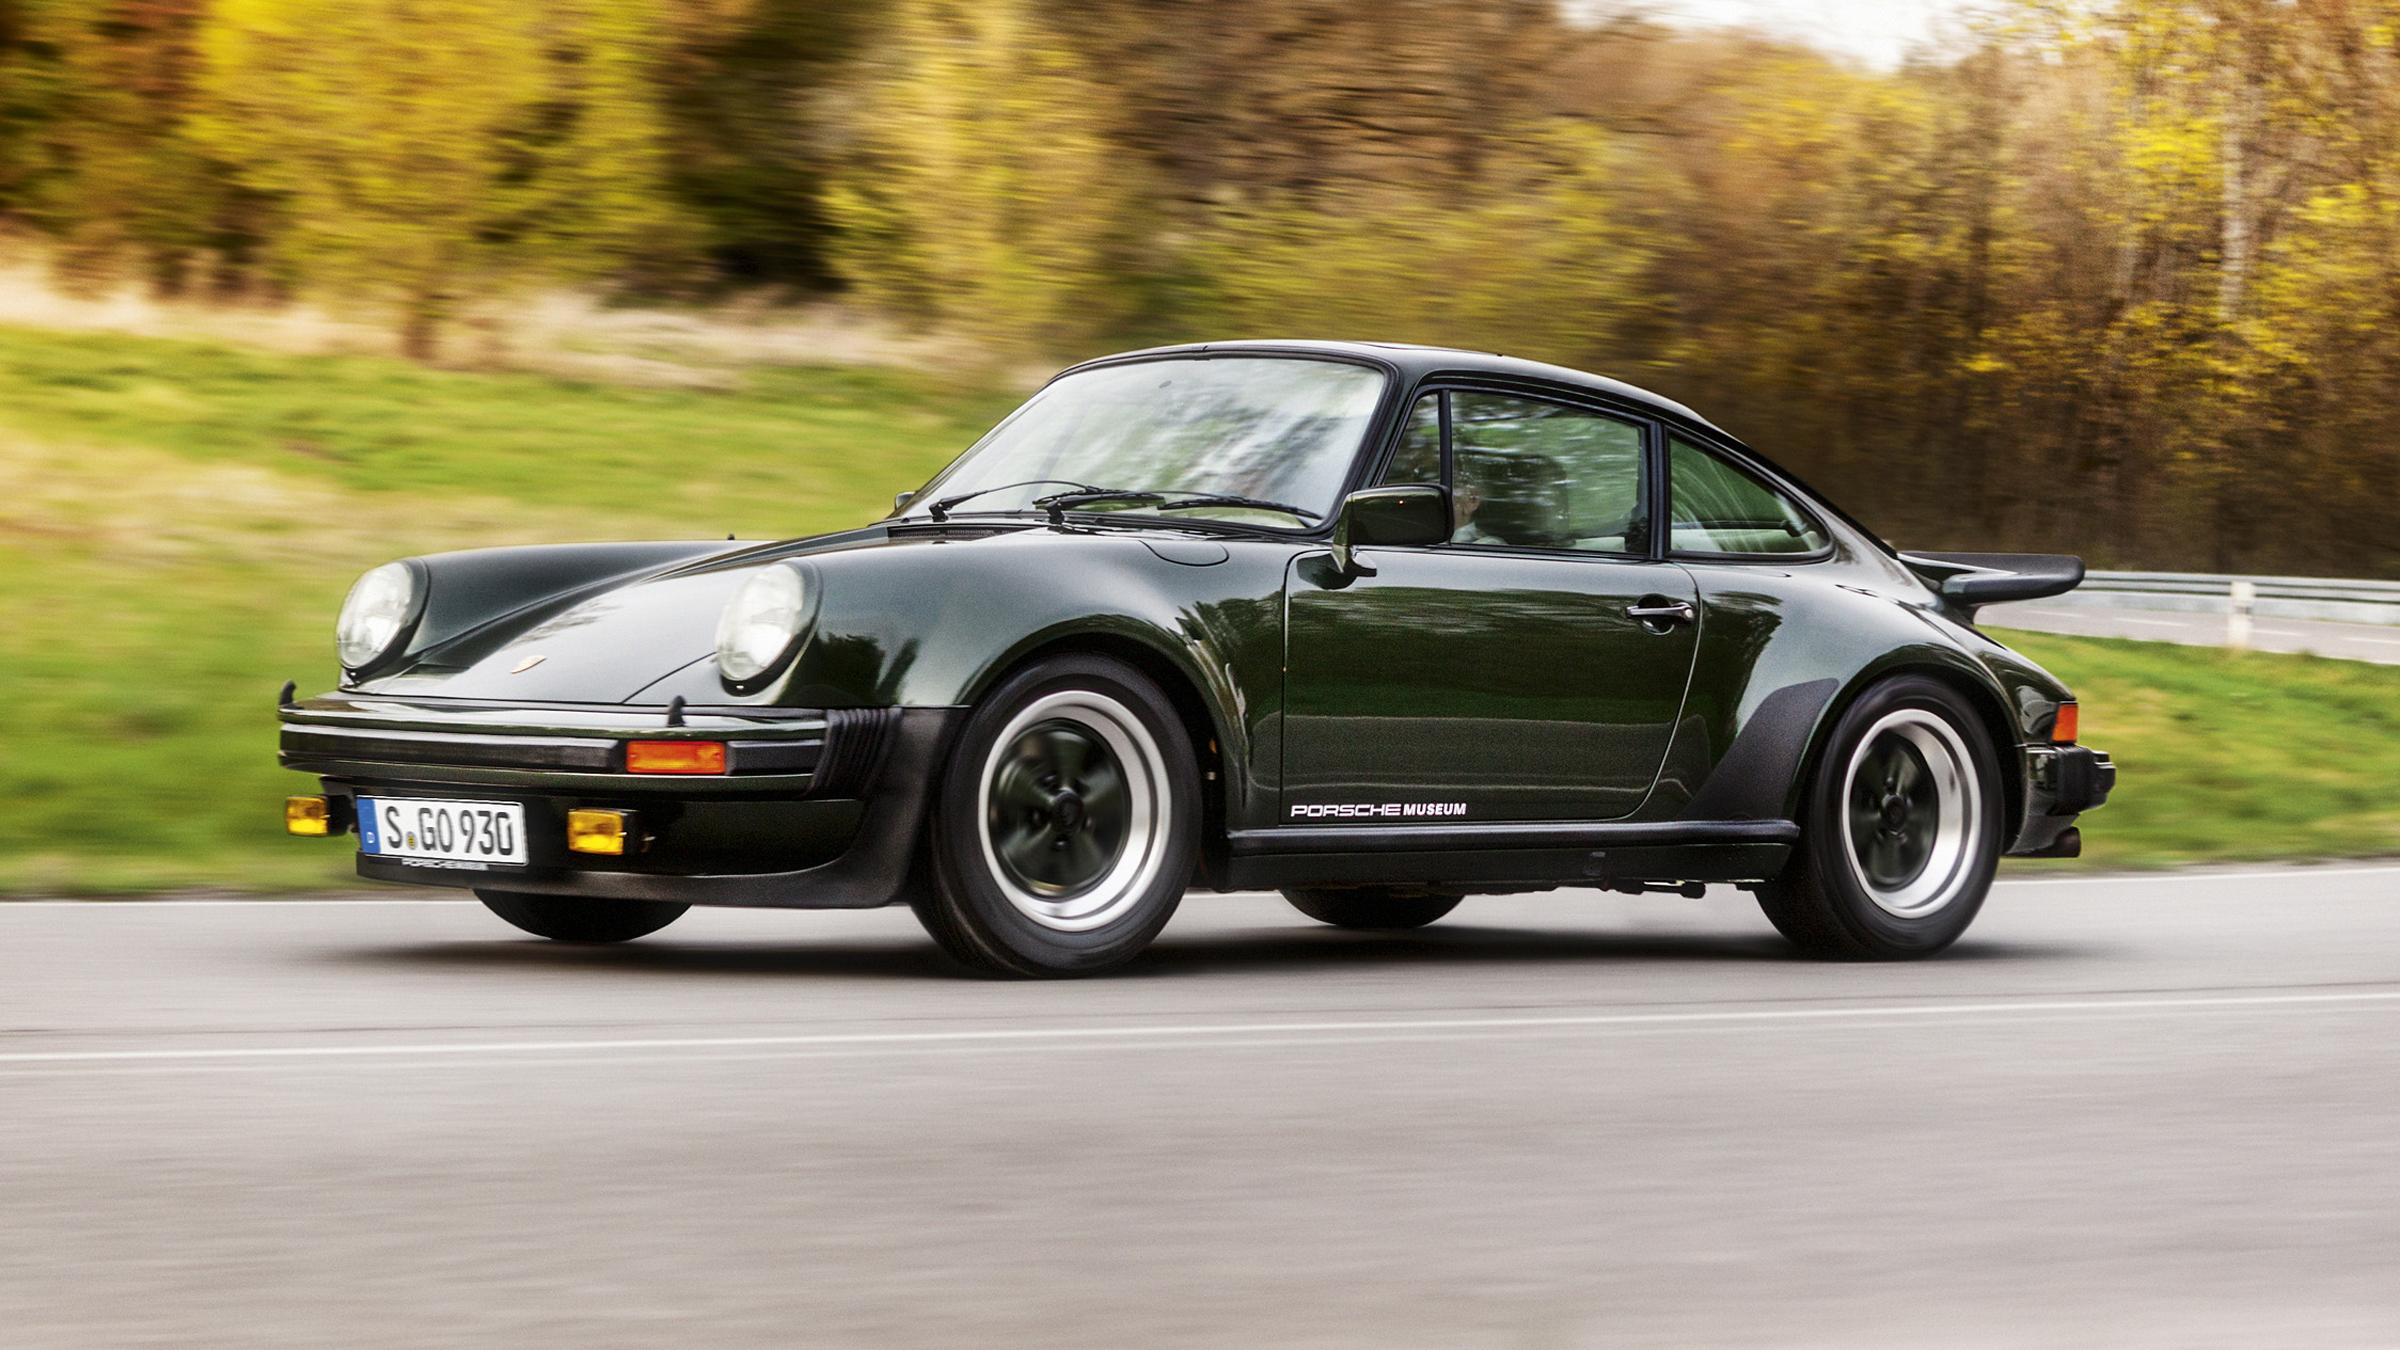 Porsche 930 911 Turbo.